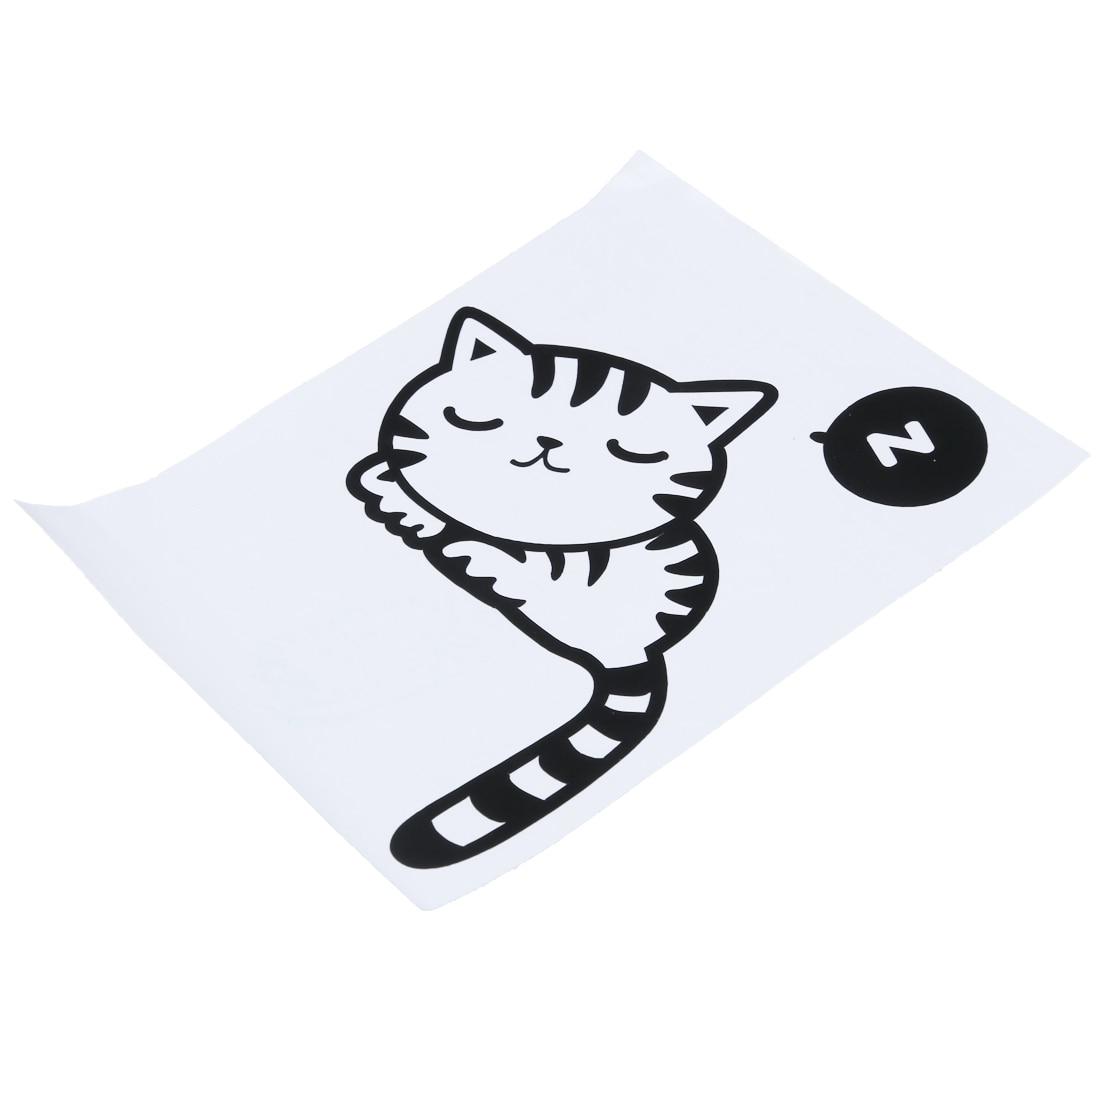 Fashion Lucu Kucing Hitam Tidur Hewan Peliharaan Switch Stiker Lampu Gantung Dinding Vinyl Di Wall Stickers Dari Rumah Taman Aliexpresscom Alibaba Group